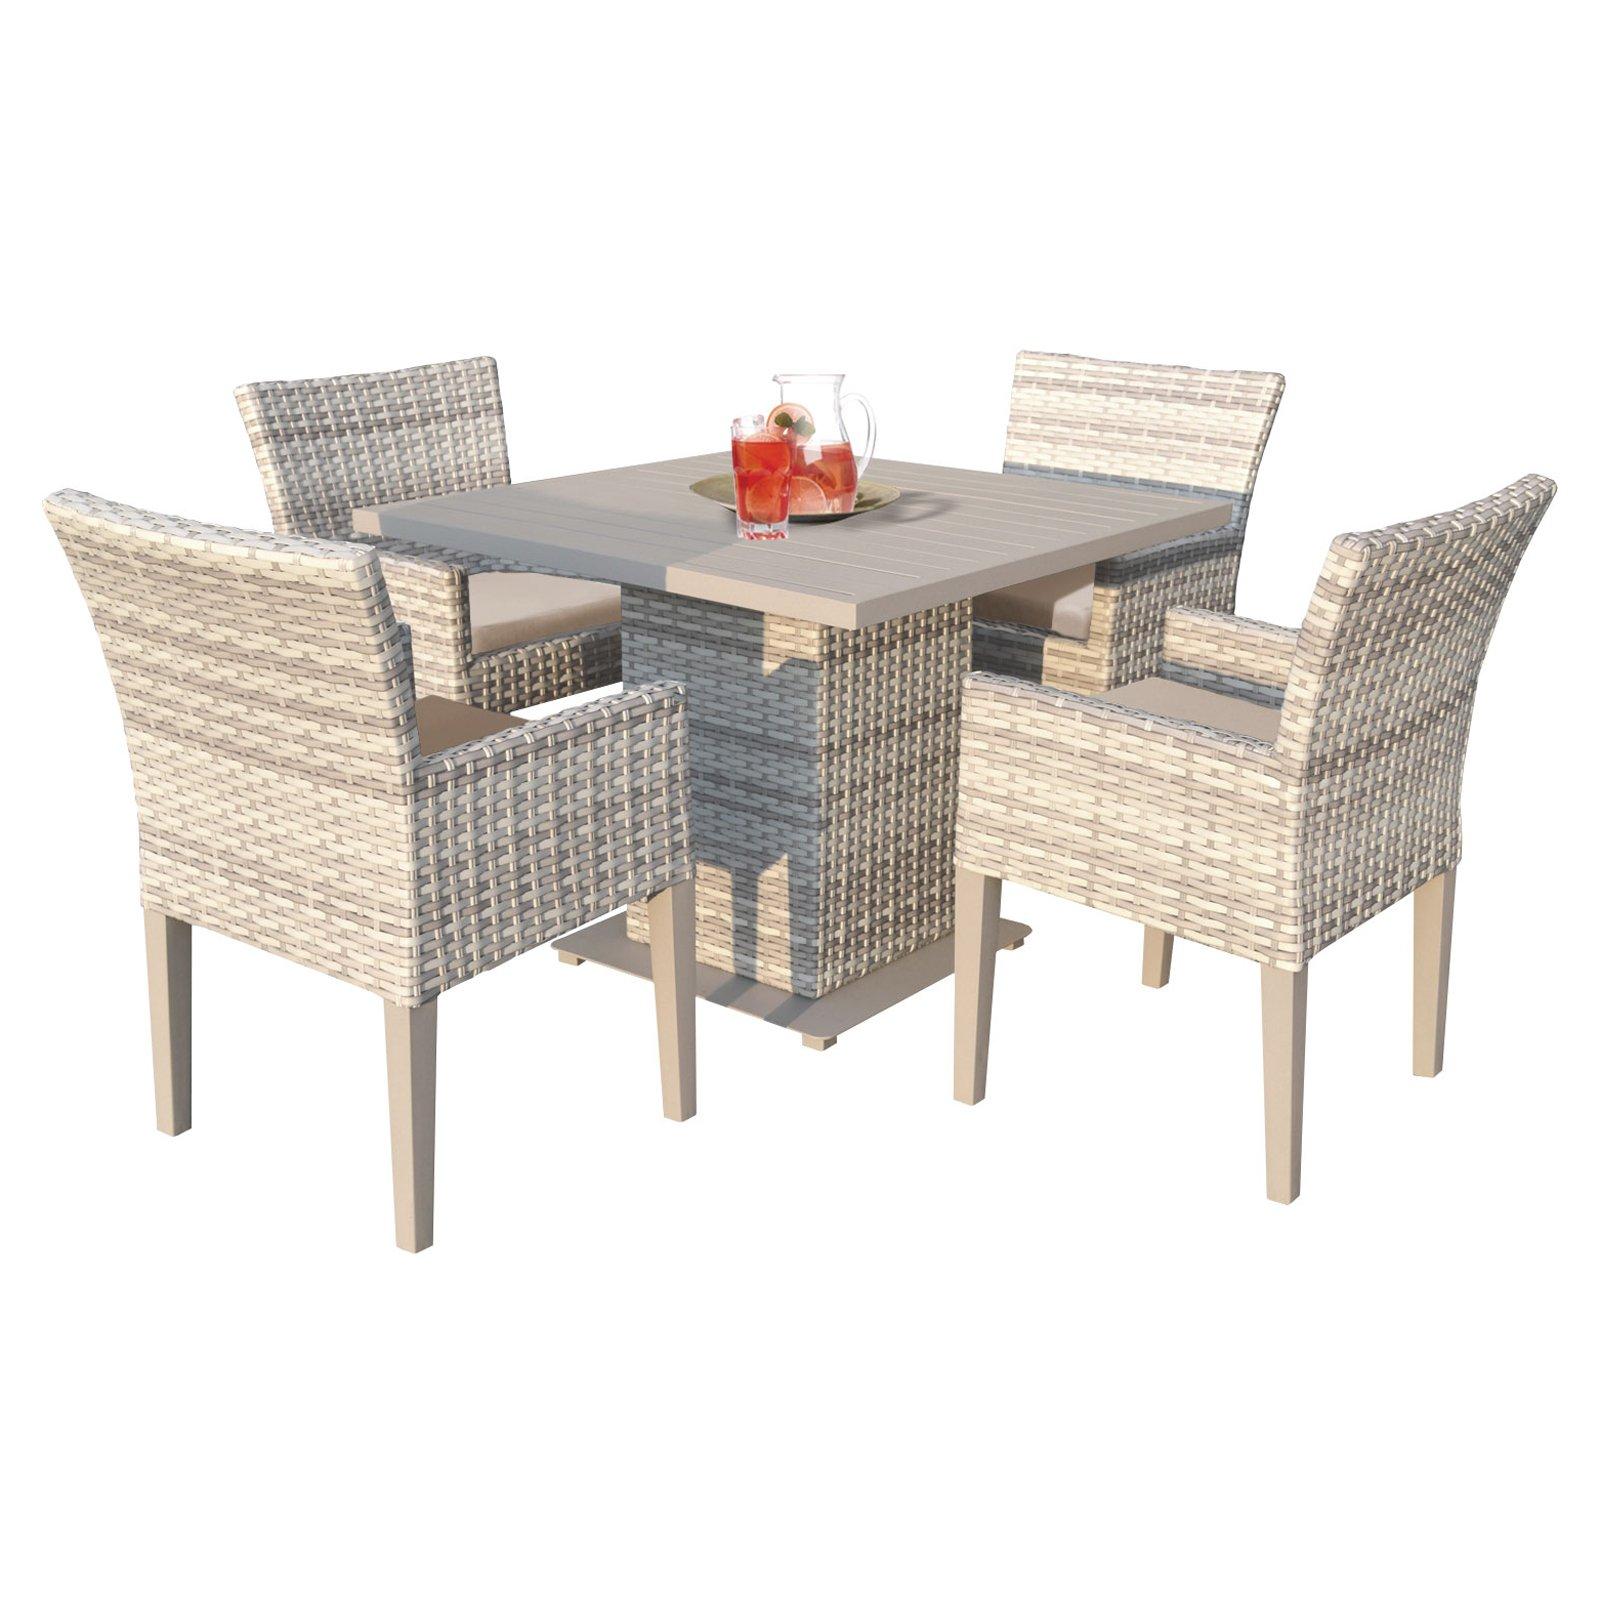 Outdoor TK Classics Fairmont Wicker 5 Piece Square Table